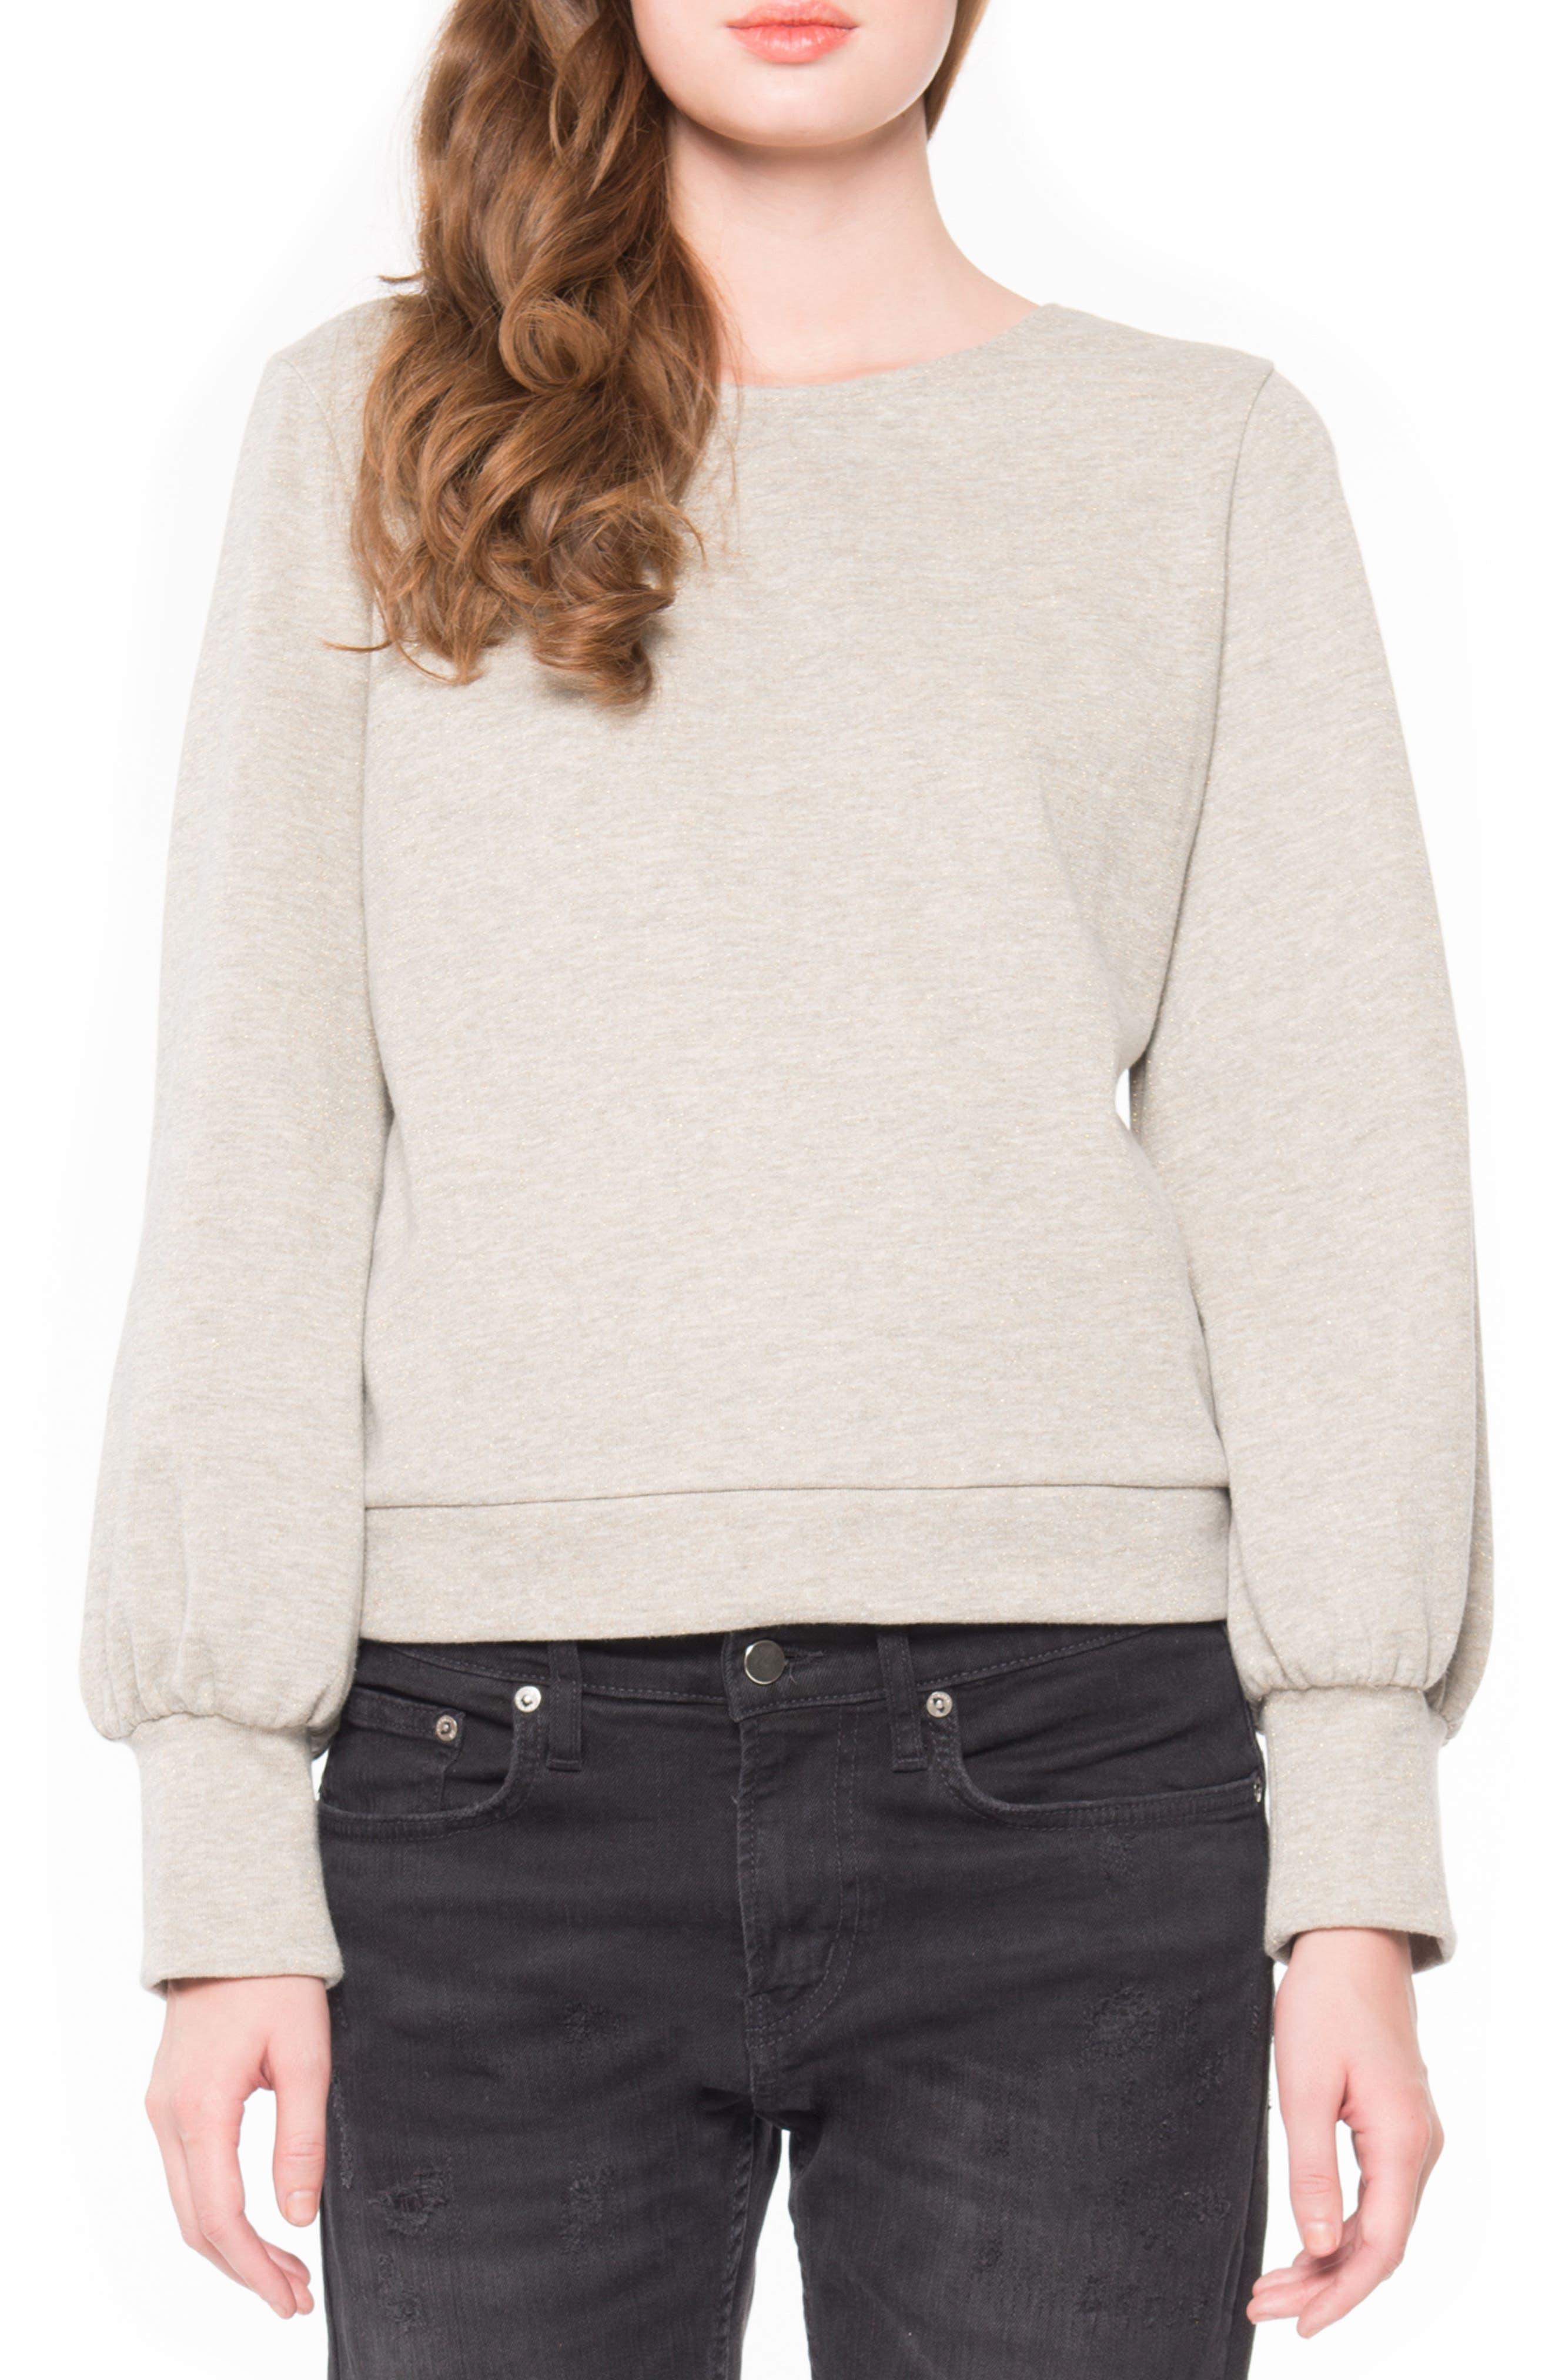 Main Image - Willow & Clay Tie Back Sweatshirt